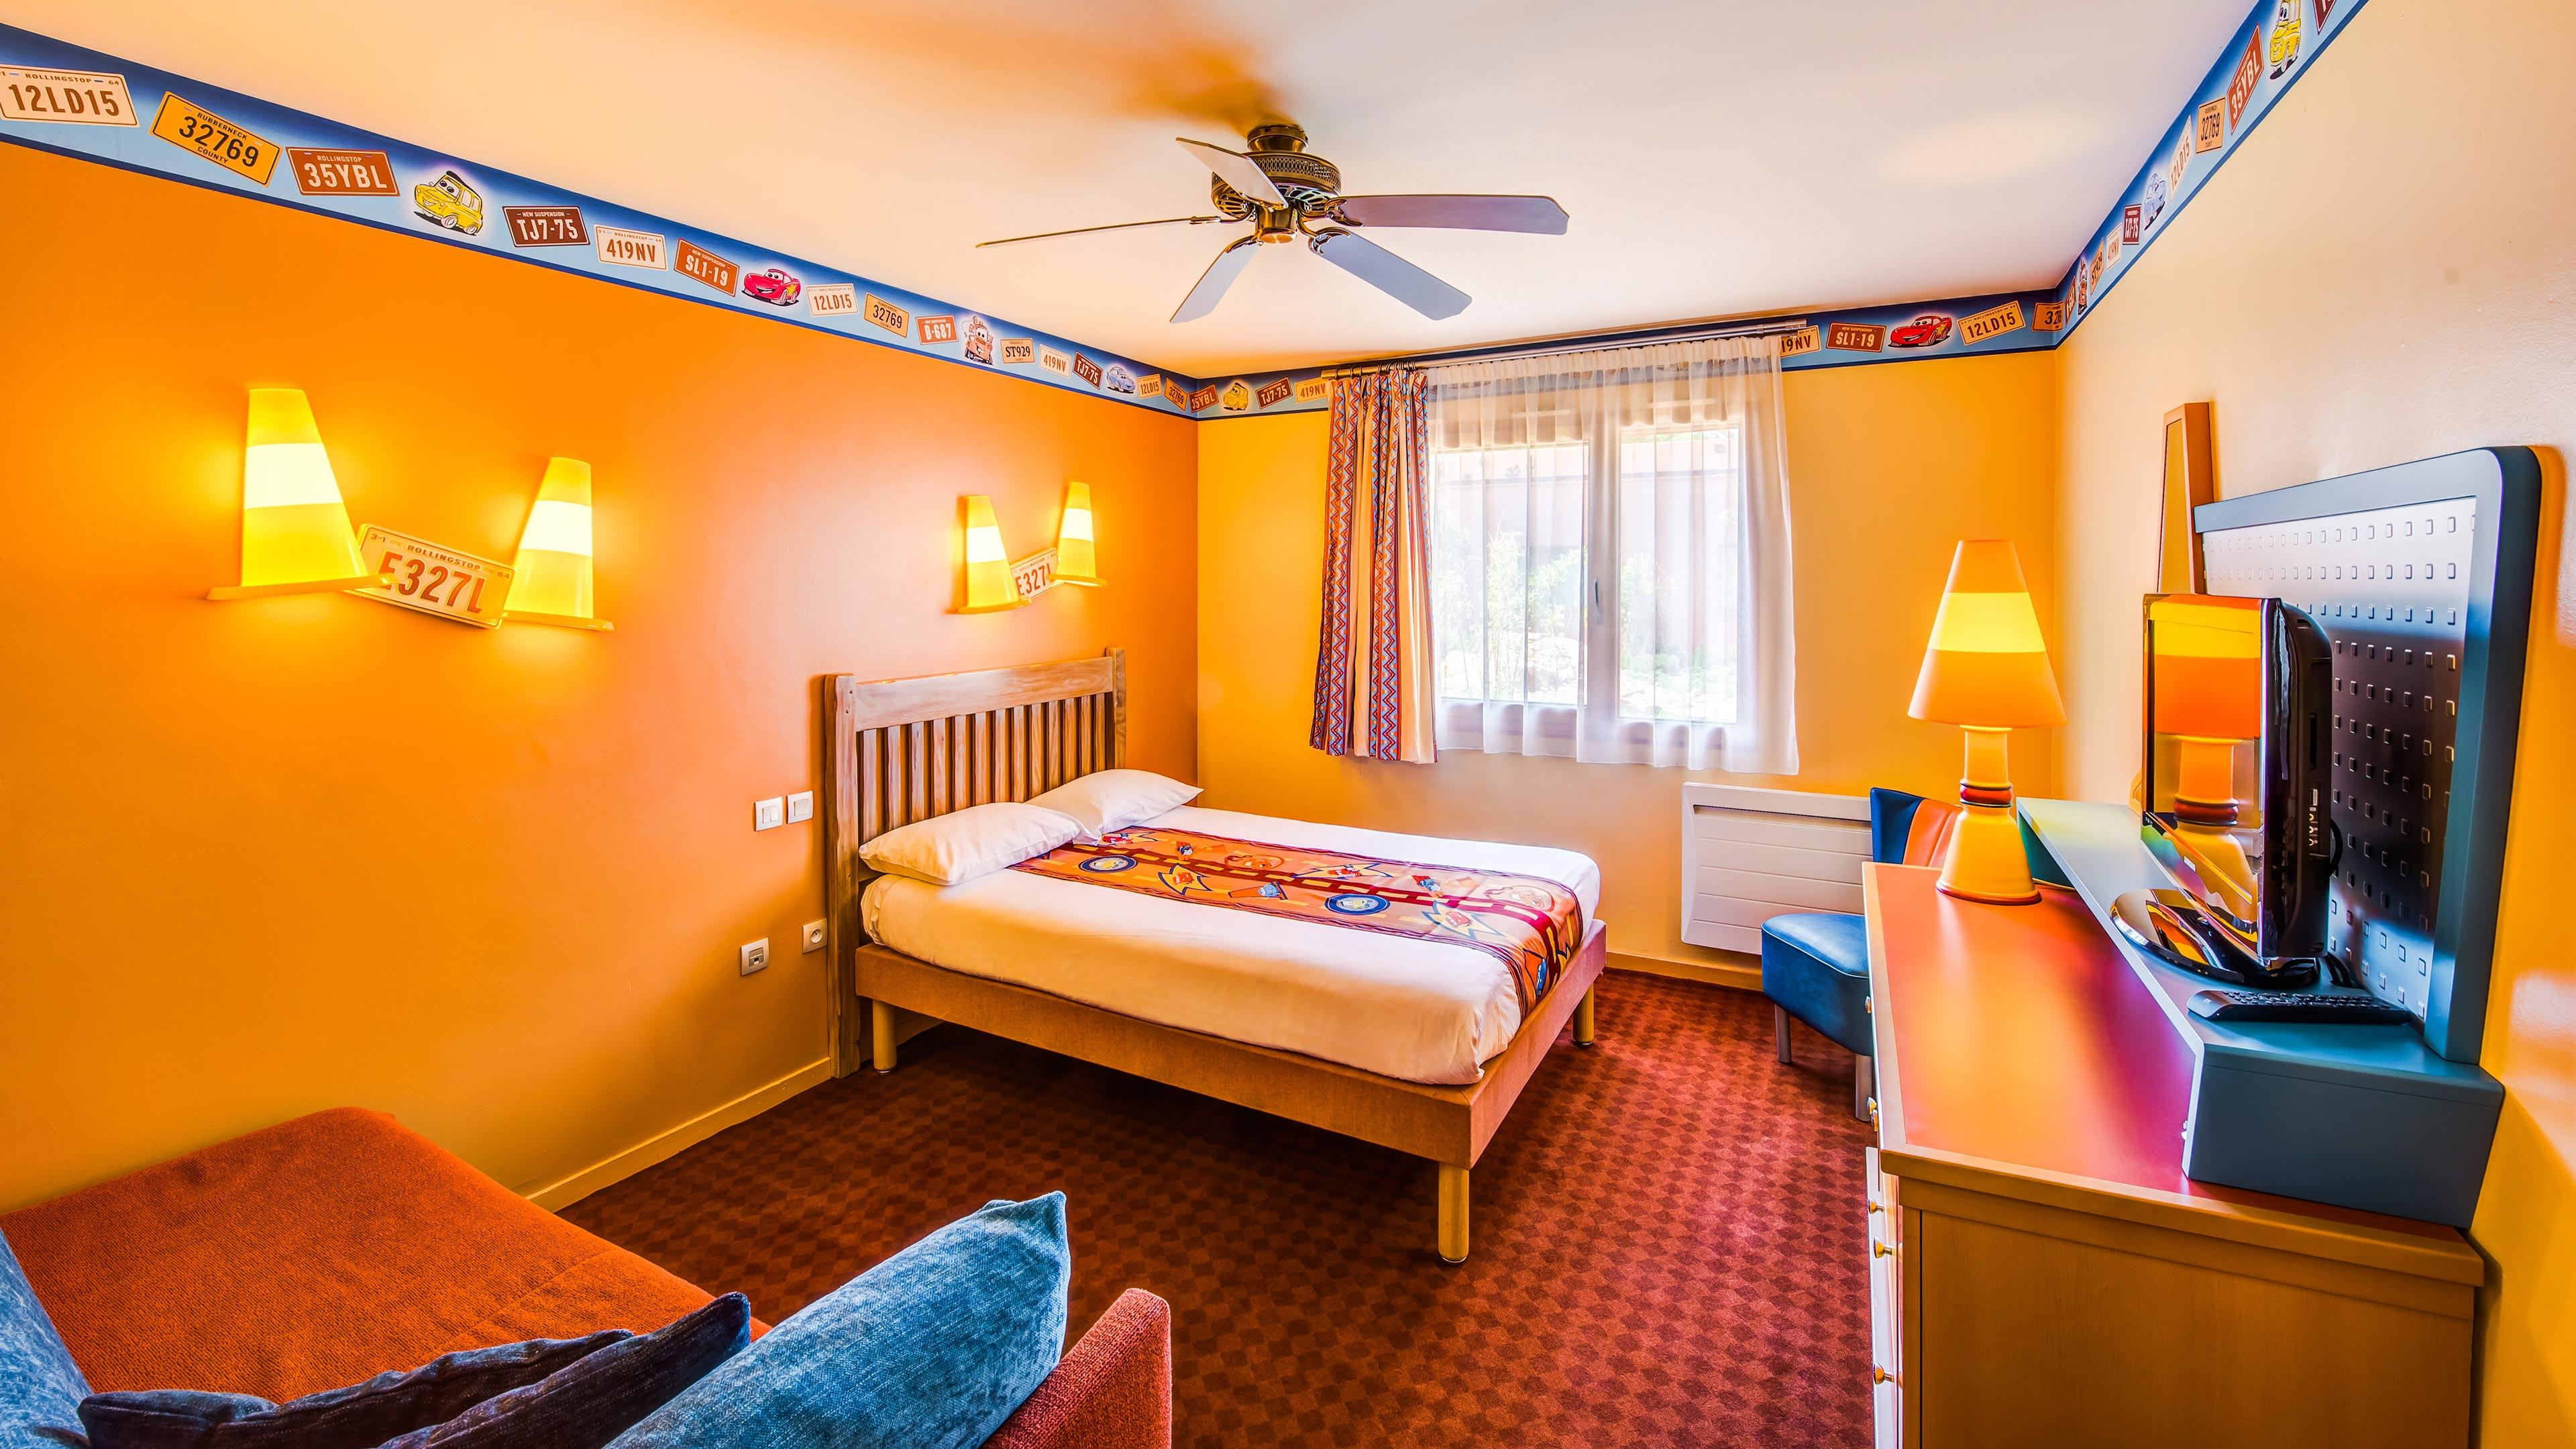 Camere Santa Fe Disneyland : Disneys hotel santa fe room rates disneyland paris hotels